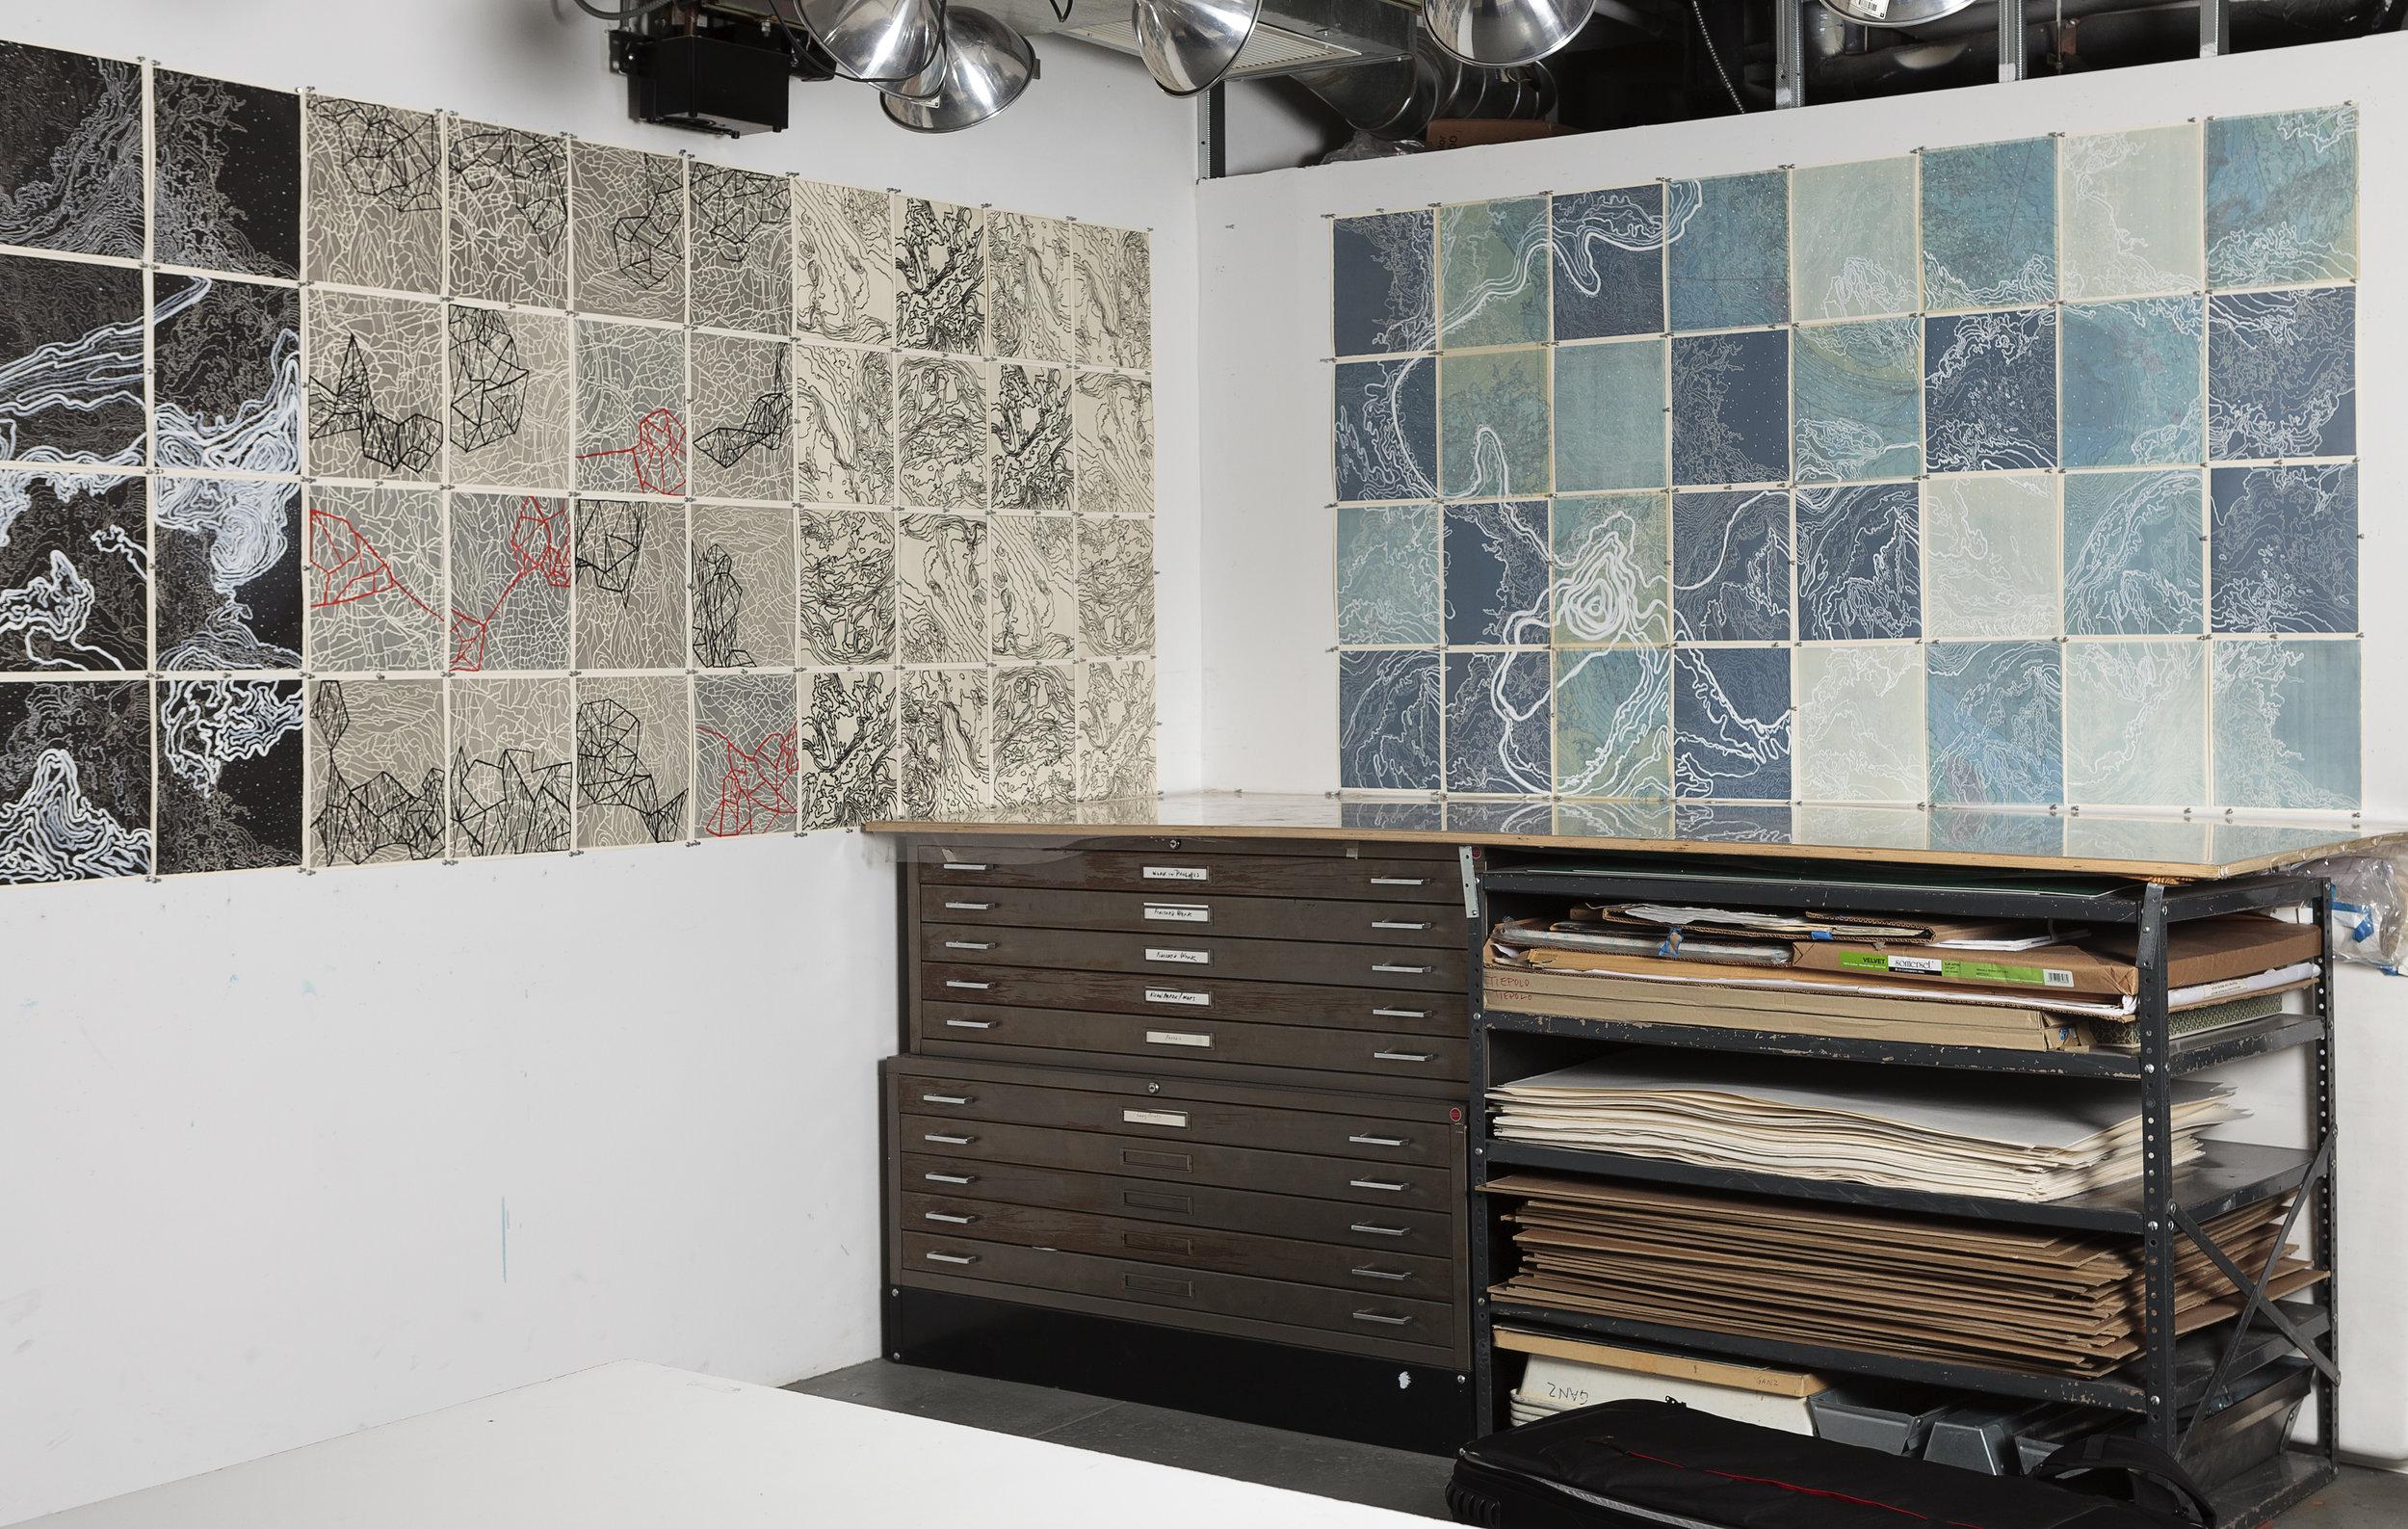 Studio Installation, 2017